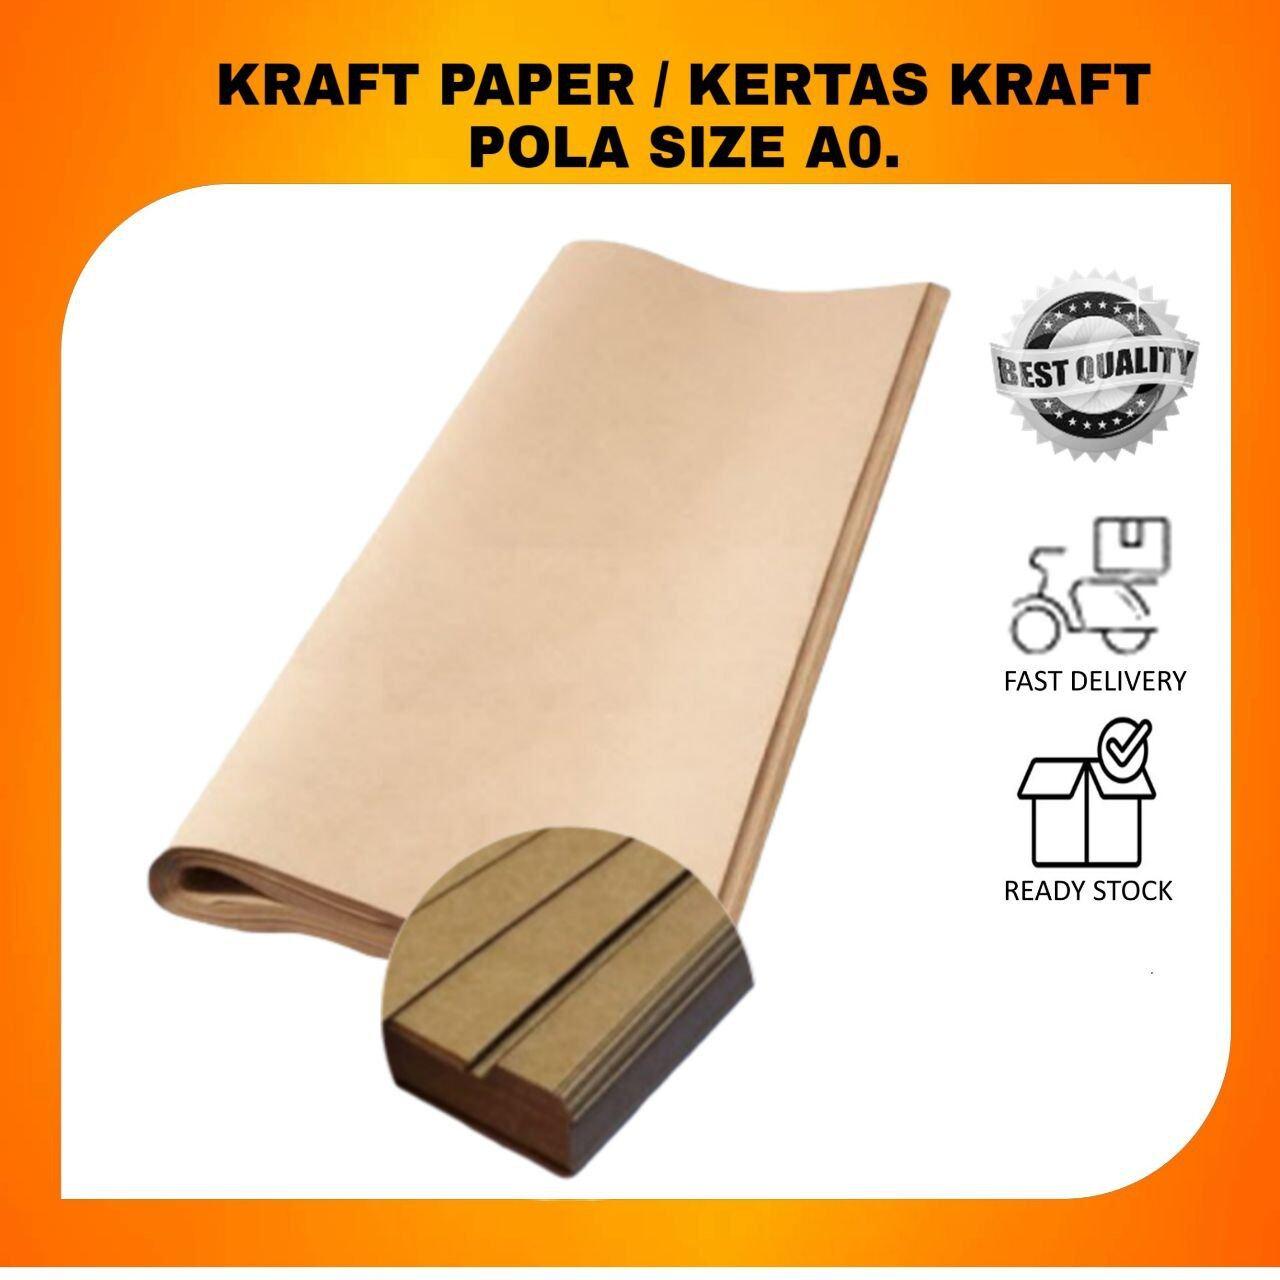 KRAFT PAPER / KERTAS KRAFT POLA SIZE A0 (10 PIECES)